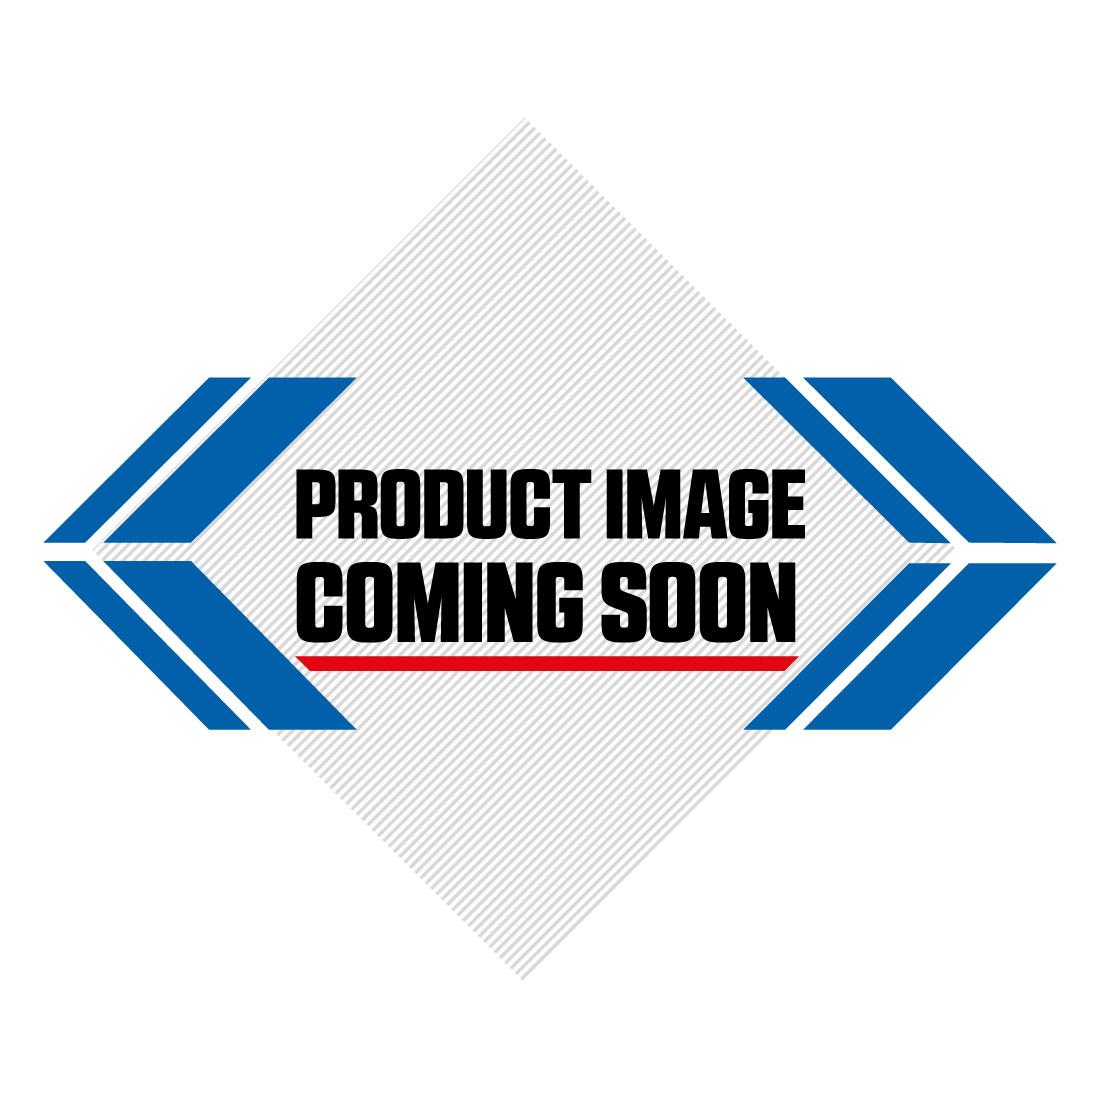 Suzuki Plastic Kit RMZ 450 (2013) OEM Factory Image-3